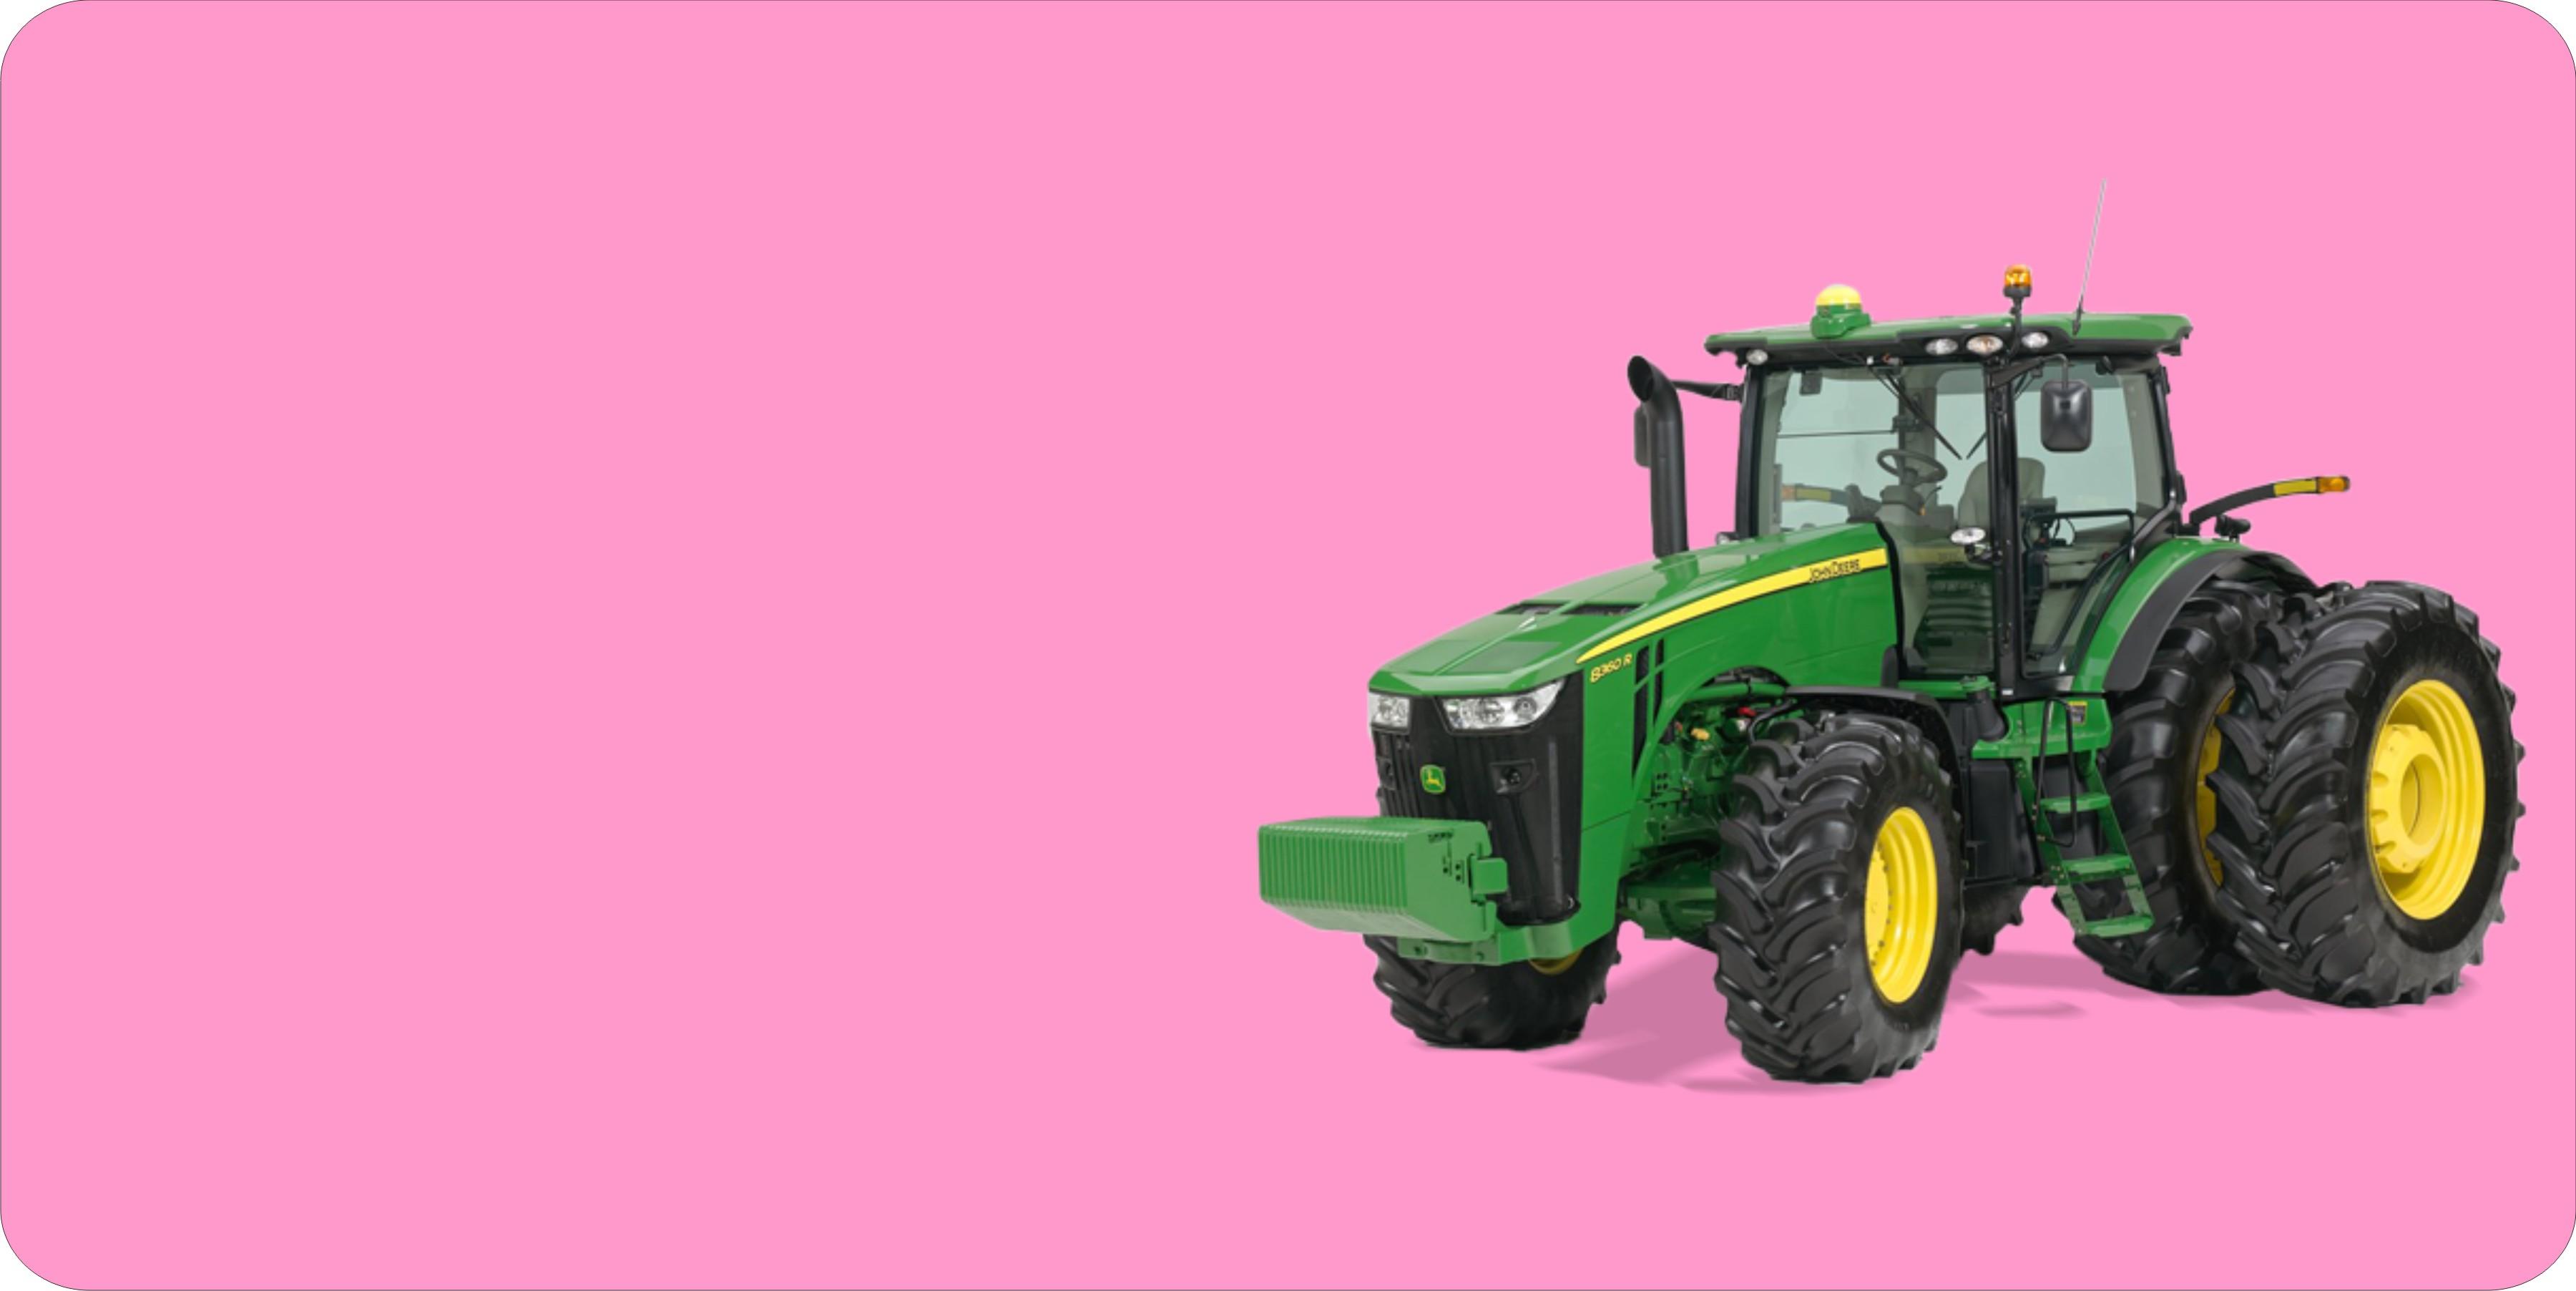 JOHN DEERE Tractor Offset On Pink Plate